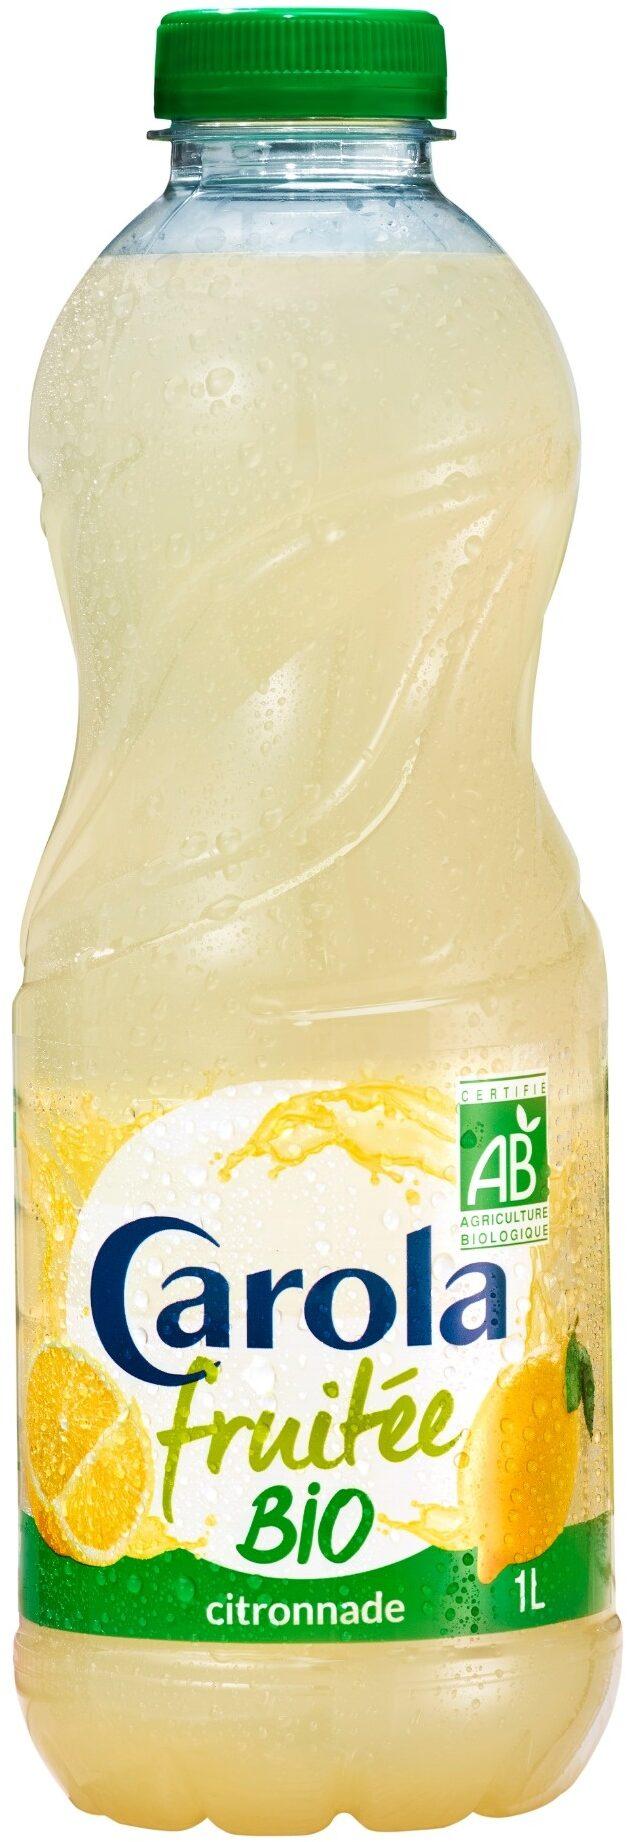 CAROLA Fruitée BIO Citronnade PET 1L - Product